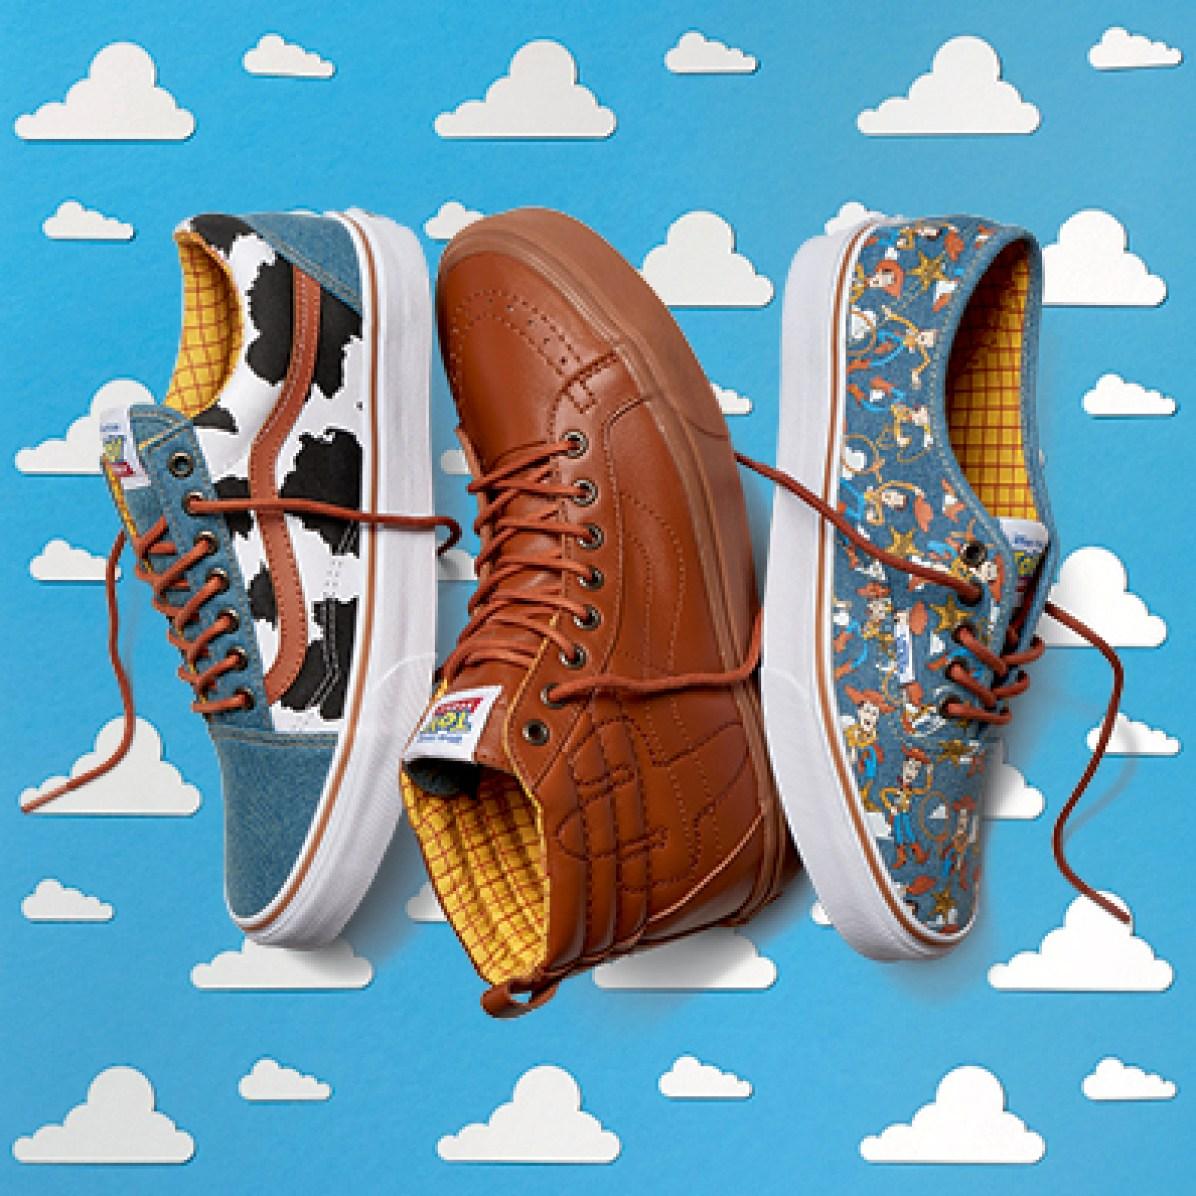 Vans x Toy Story